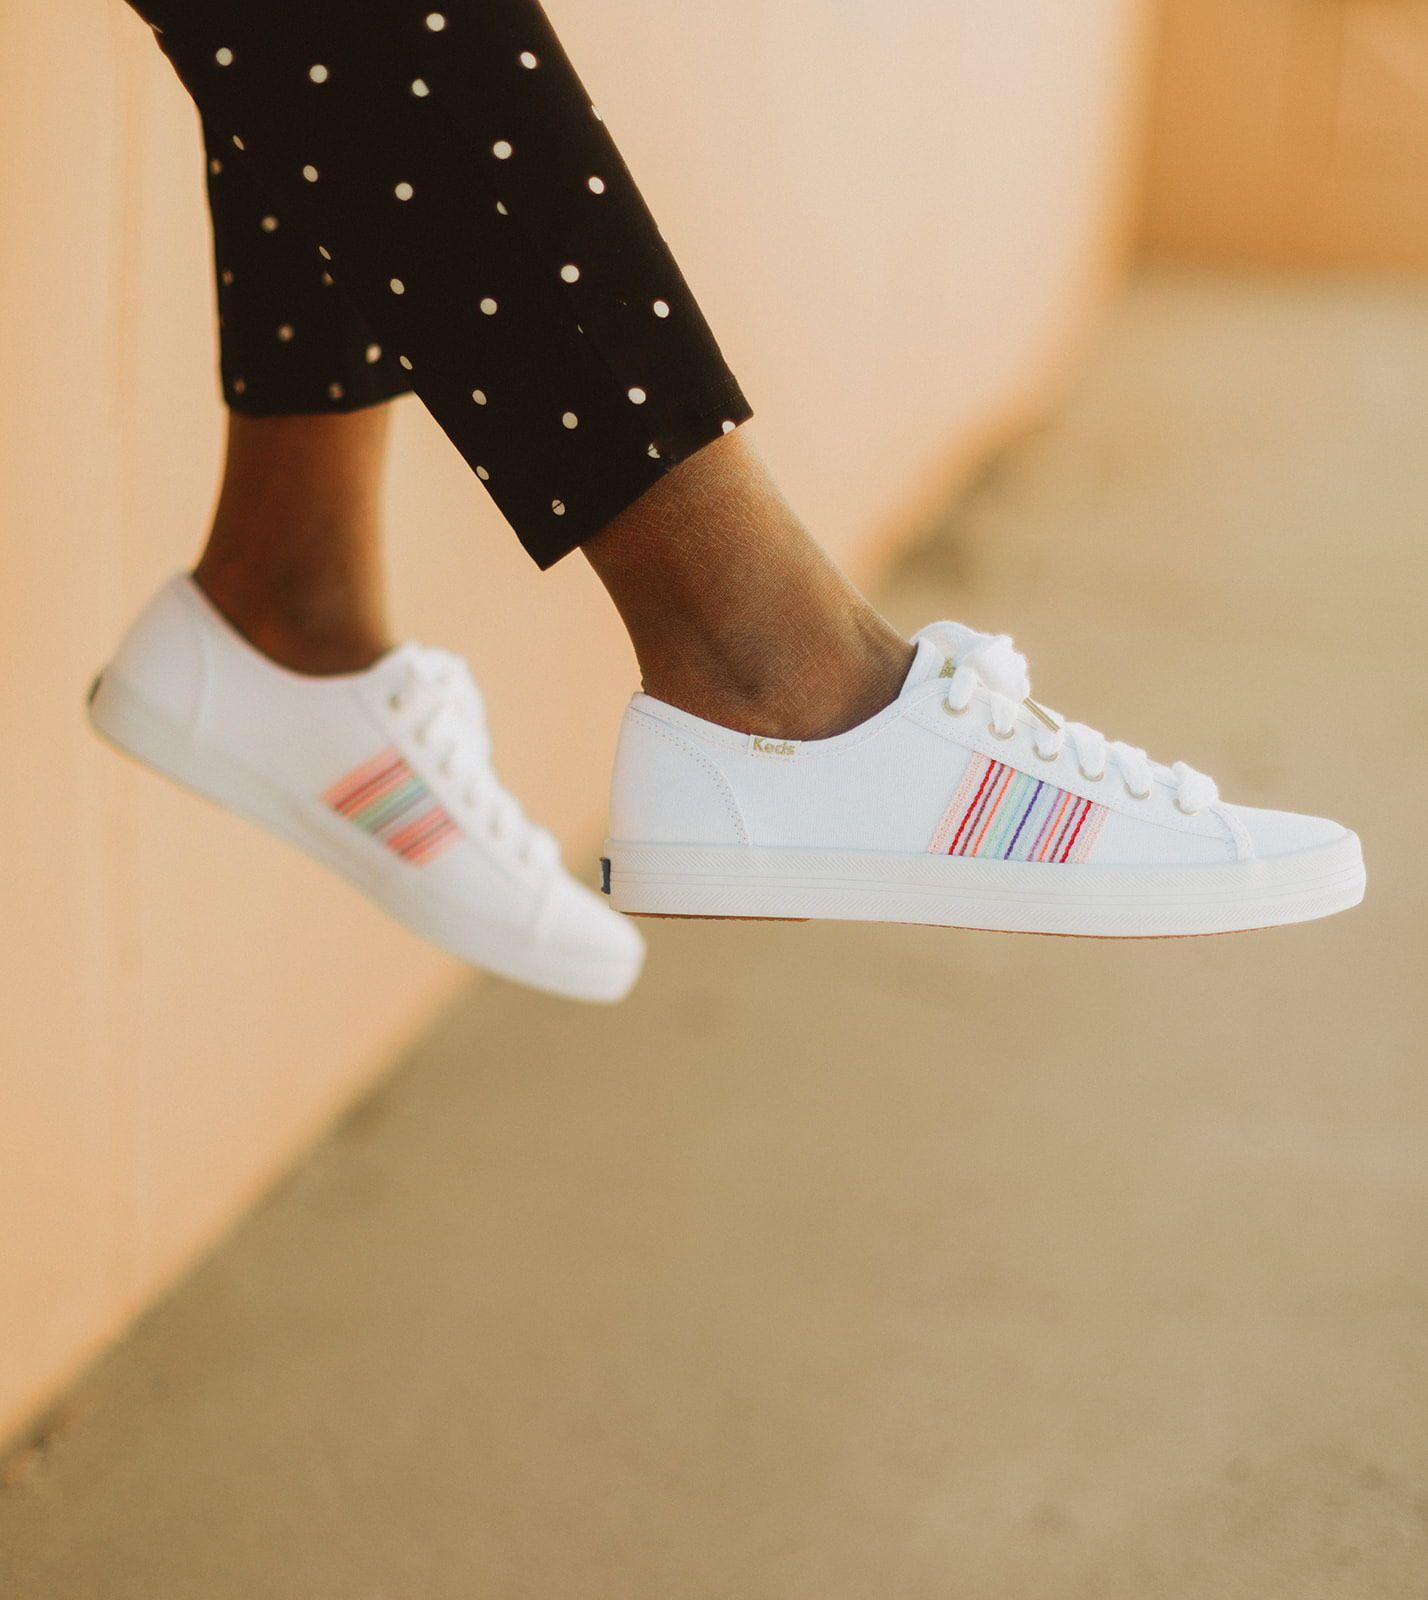 Pin on Shoe Inspiration